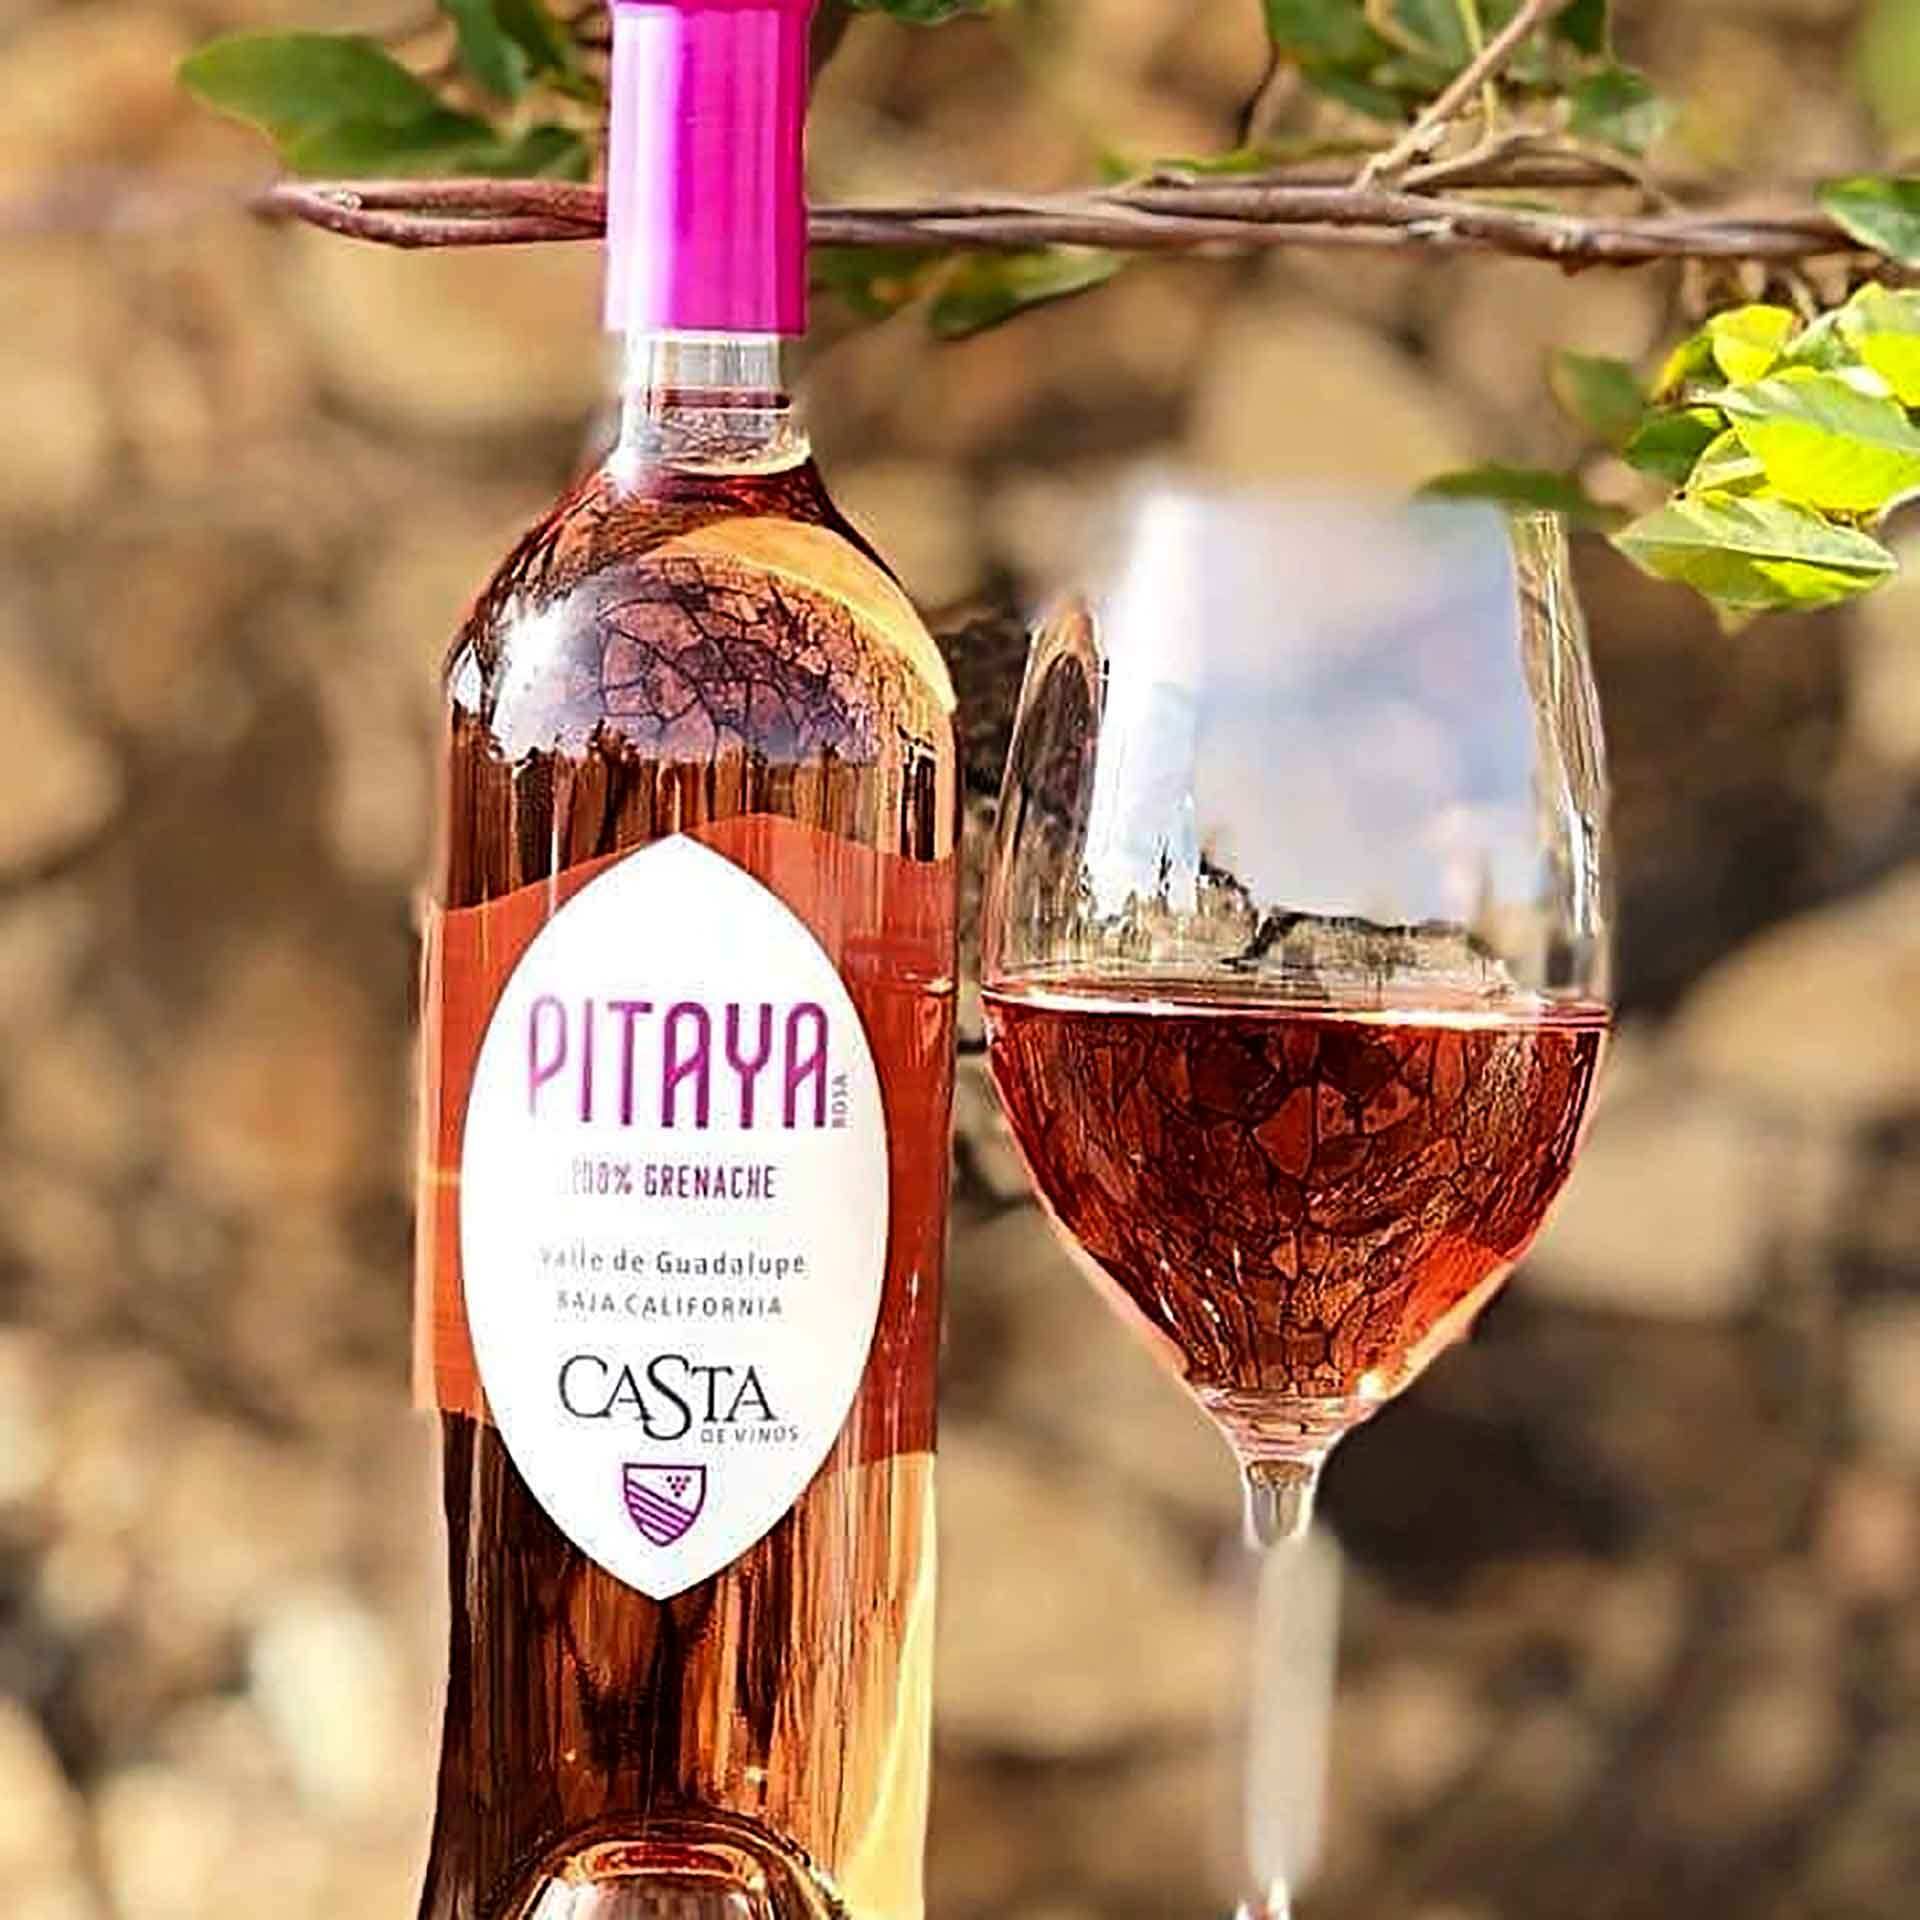 Vinos mexicanos, Pitaya